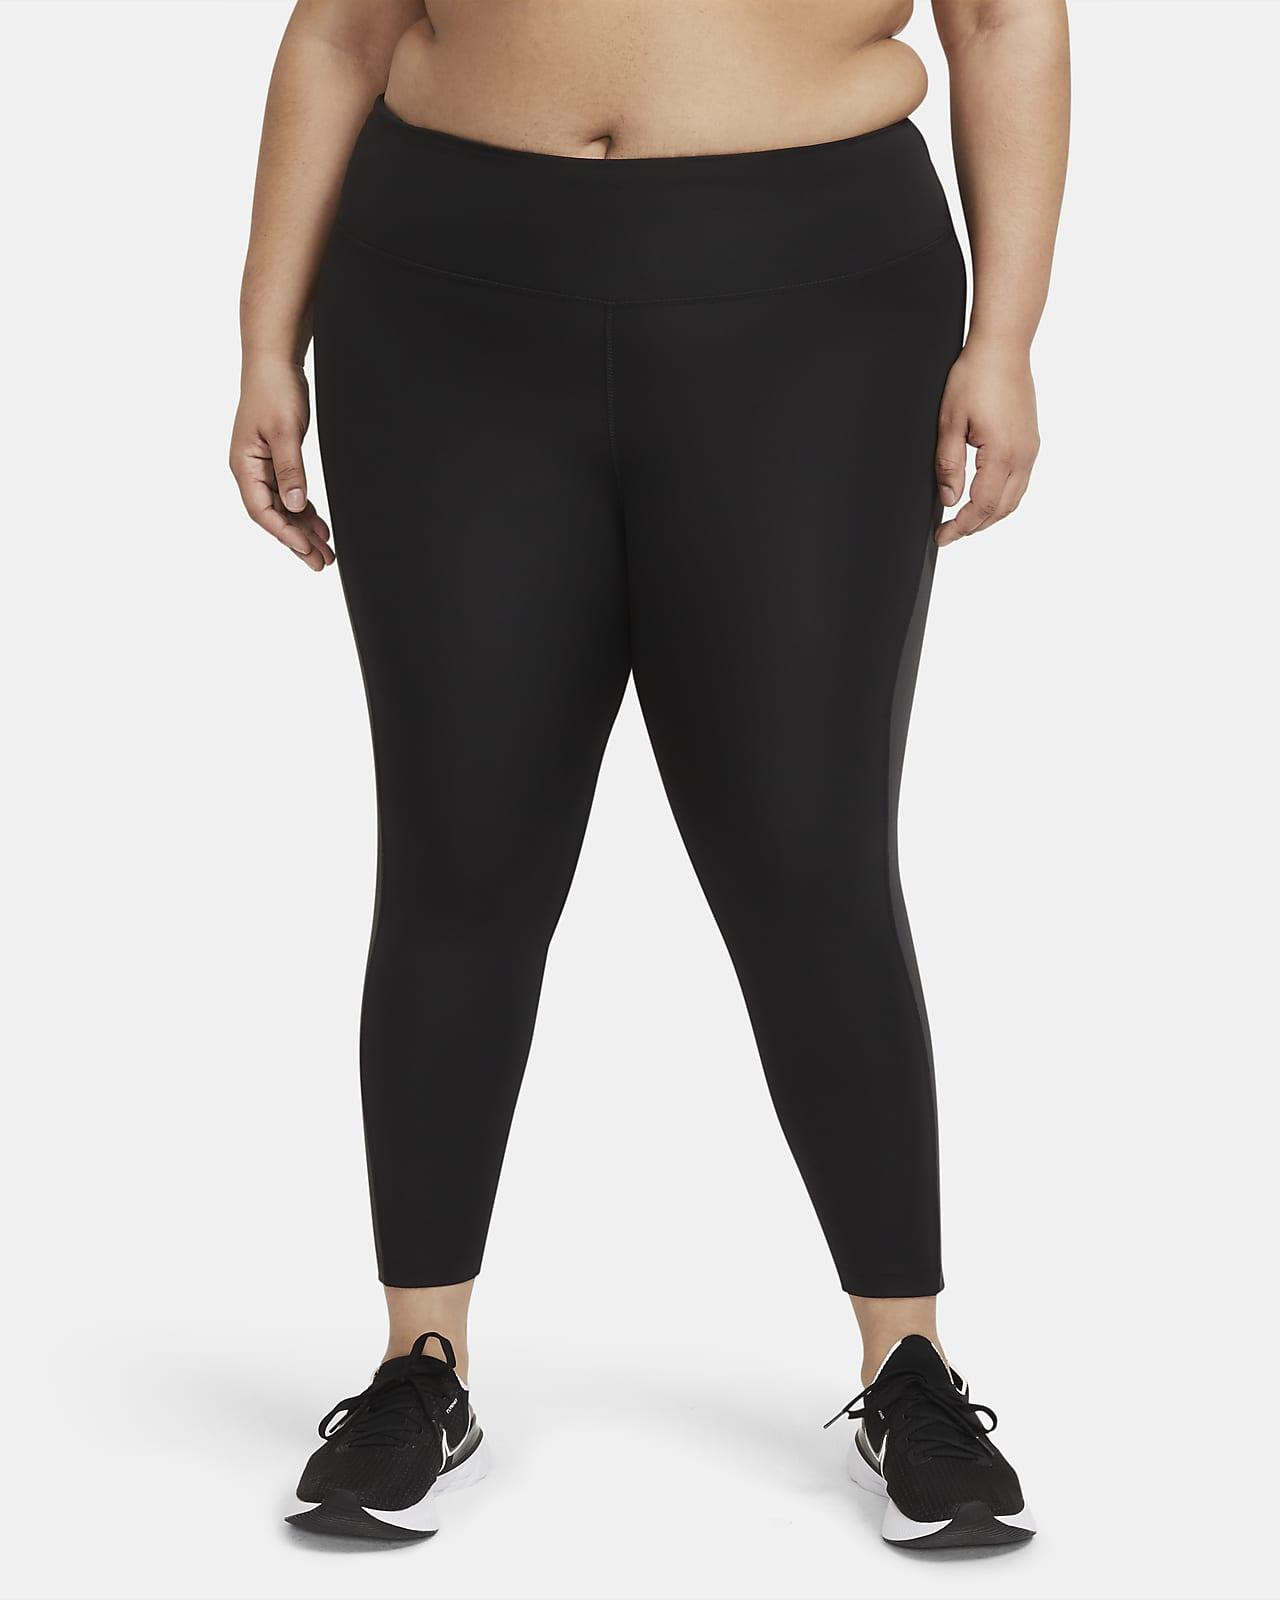 Nike Epic Fast Women's 7/8 Running Leggings (Plus Size)